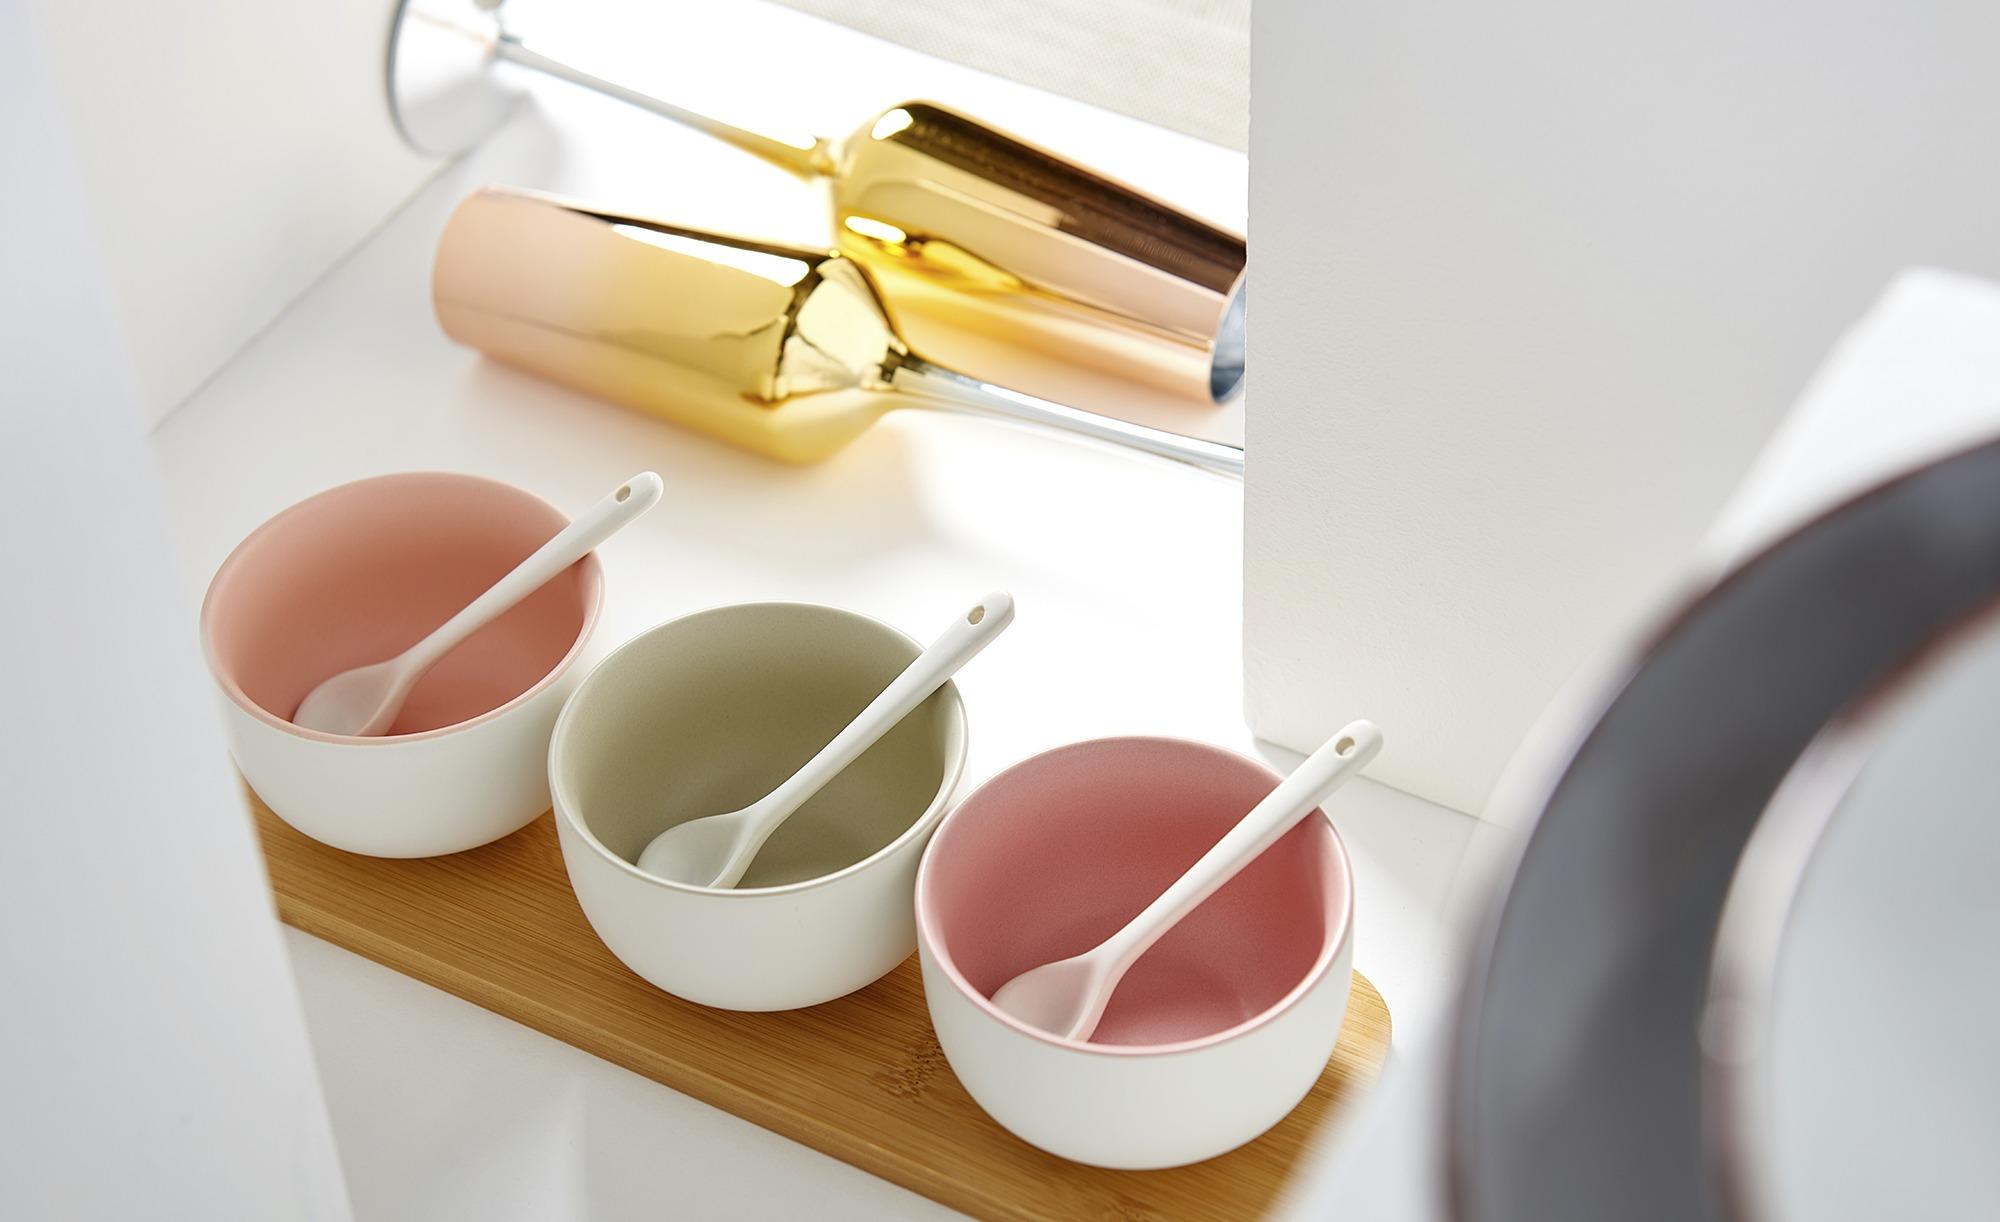 Sektglas mit goldfarbenem Kelch